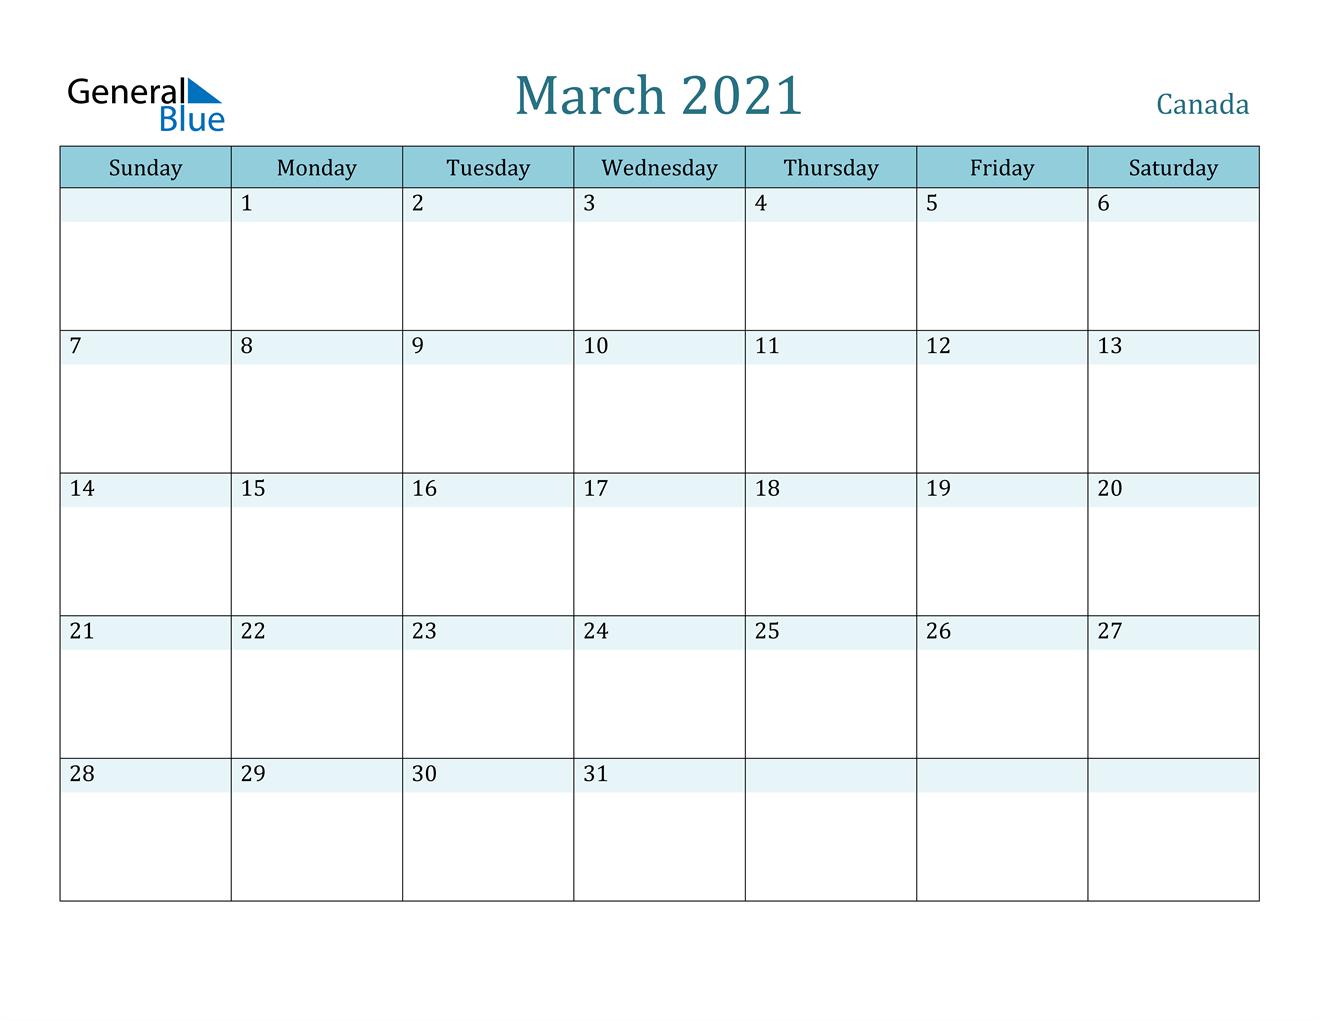 March 2021 Calendar - Canada